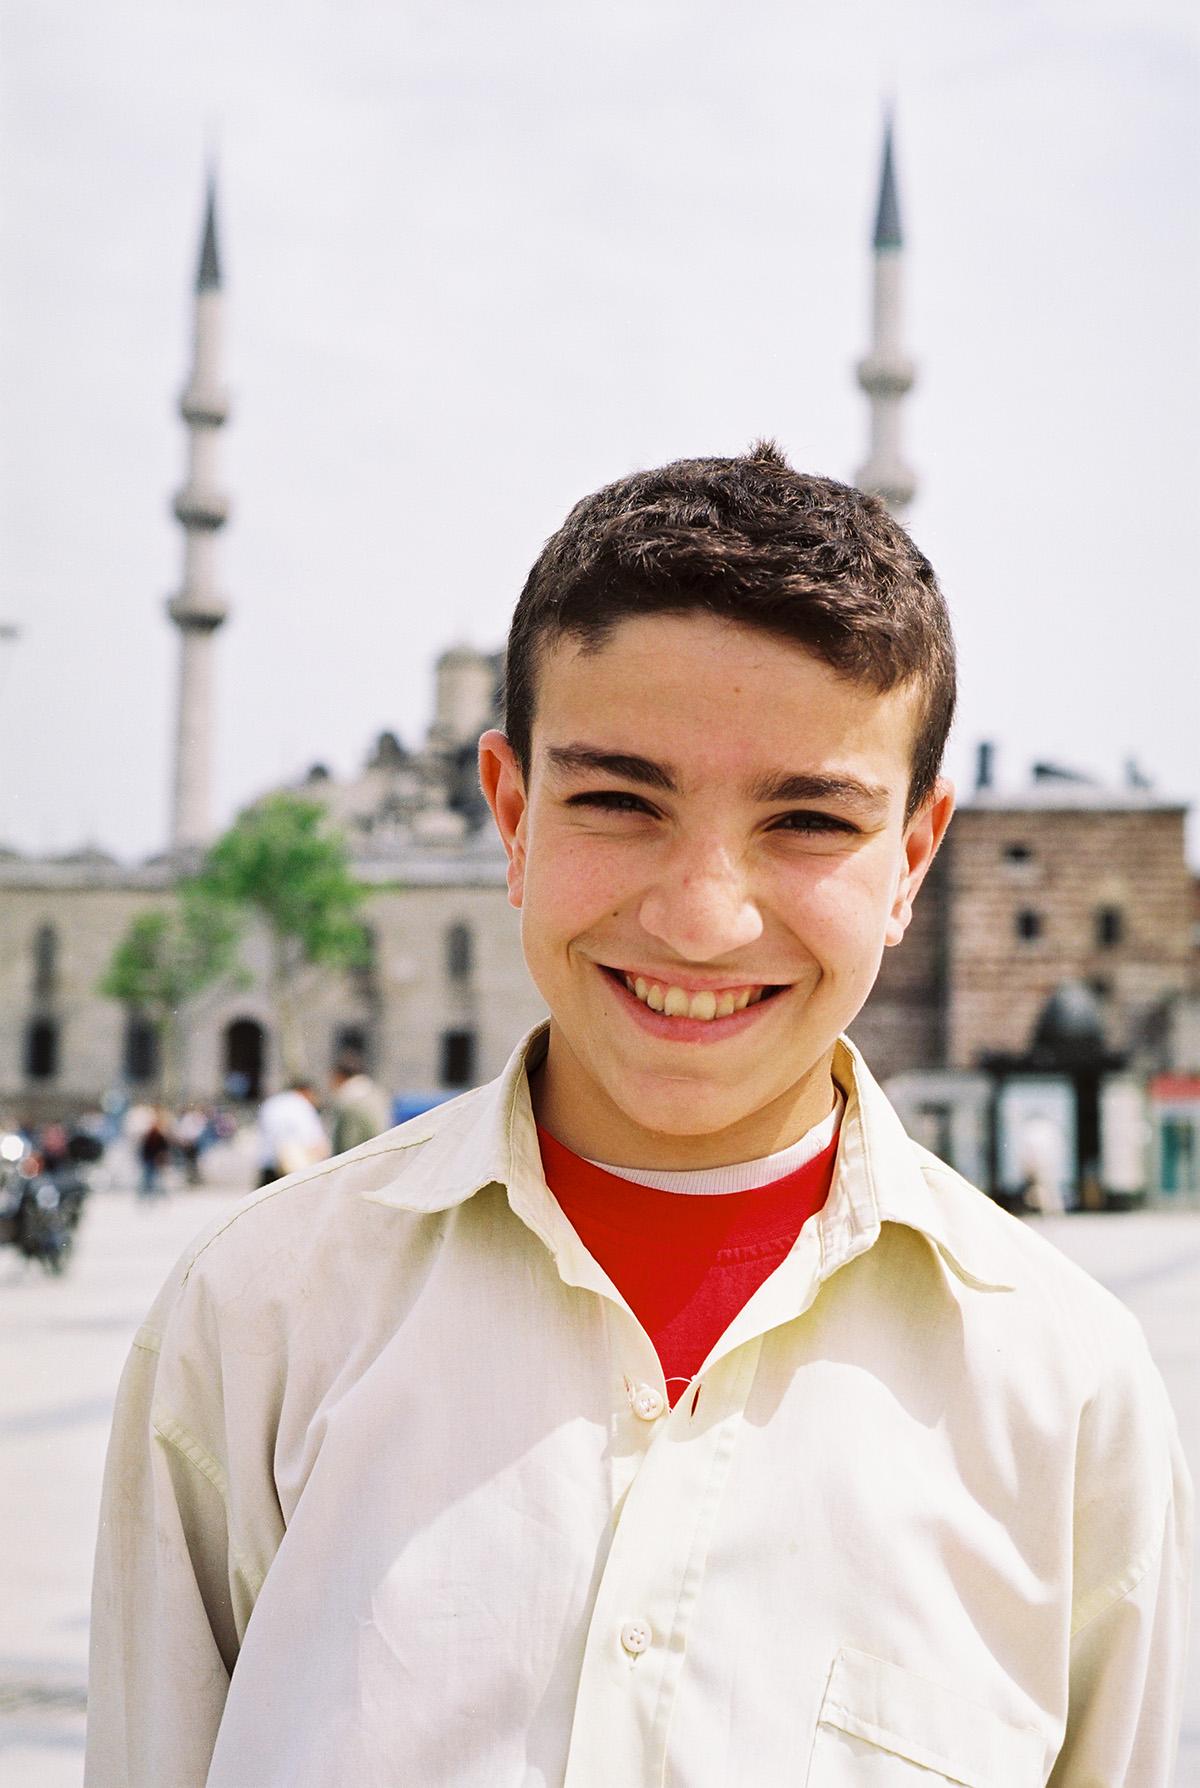 İstanbuli koolipoiss